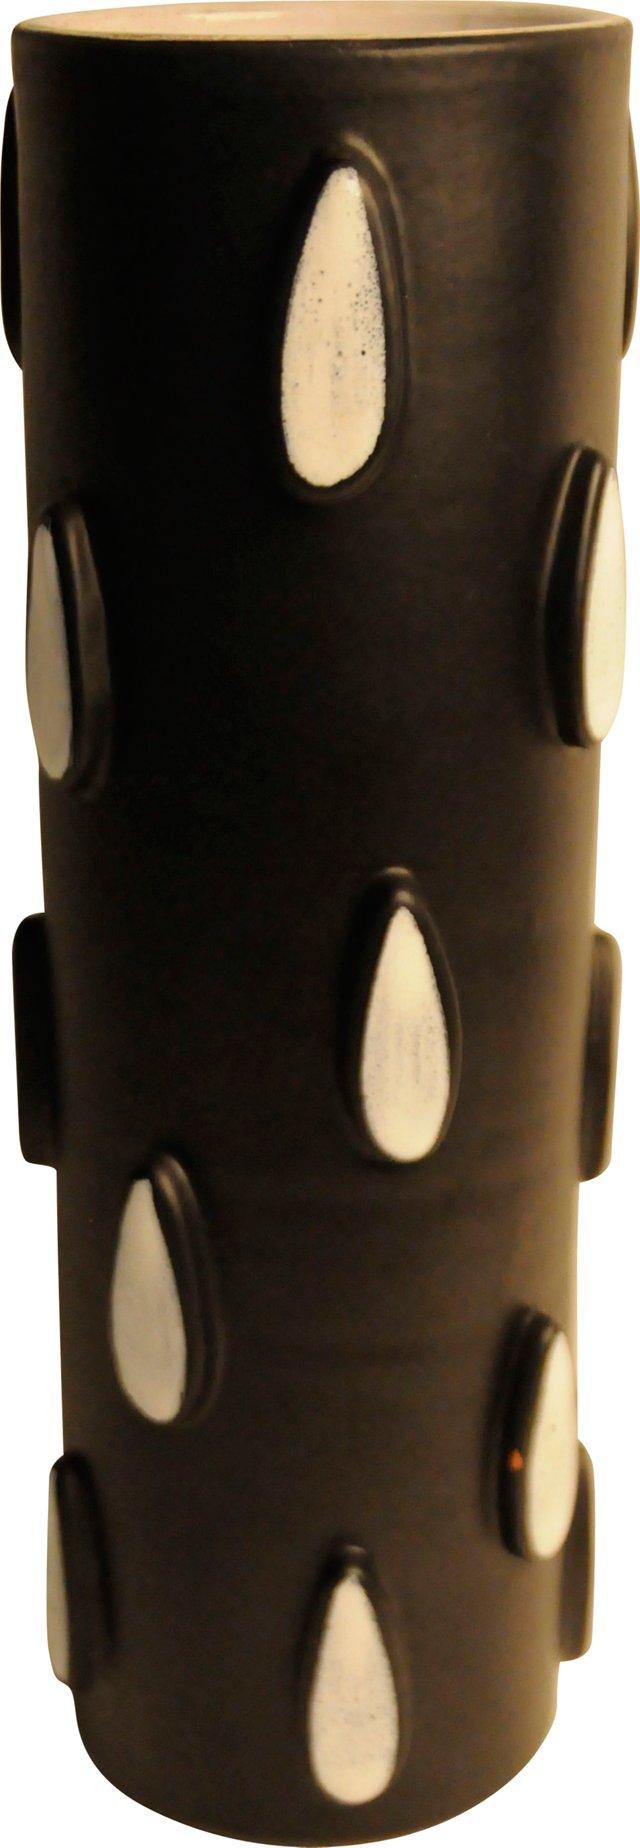 Black & White Teardrop Vase